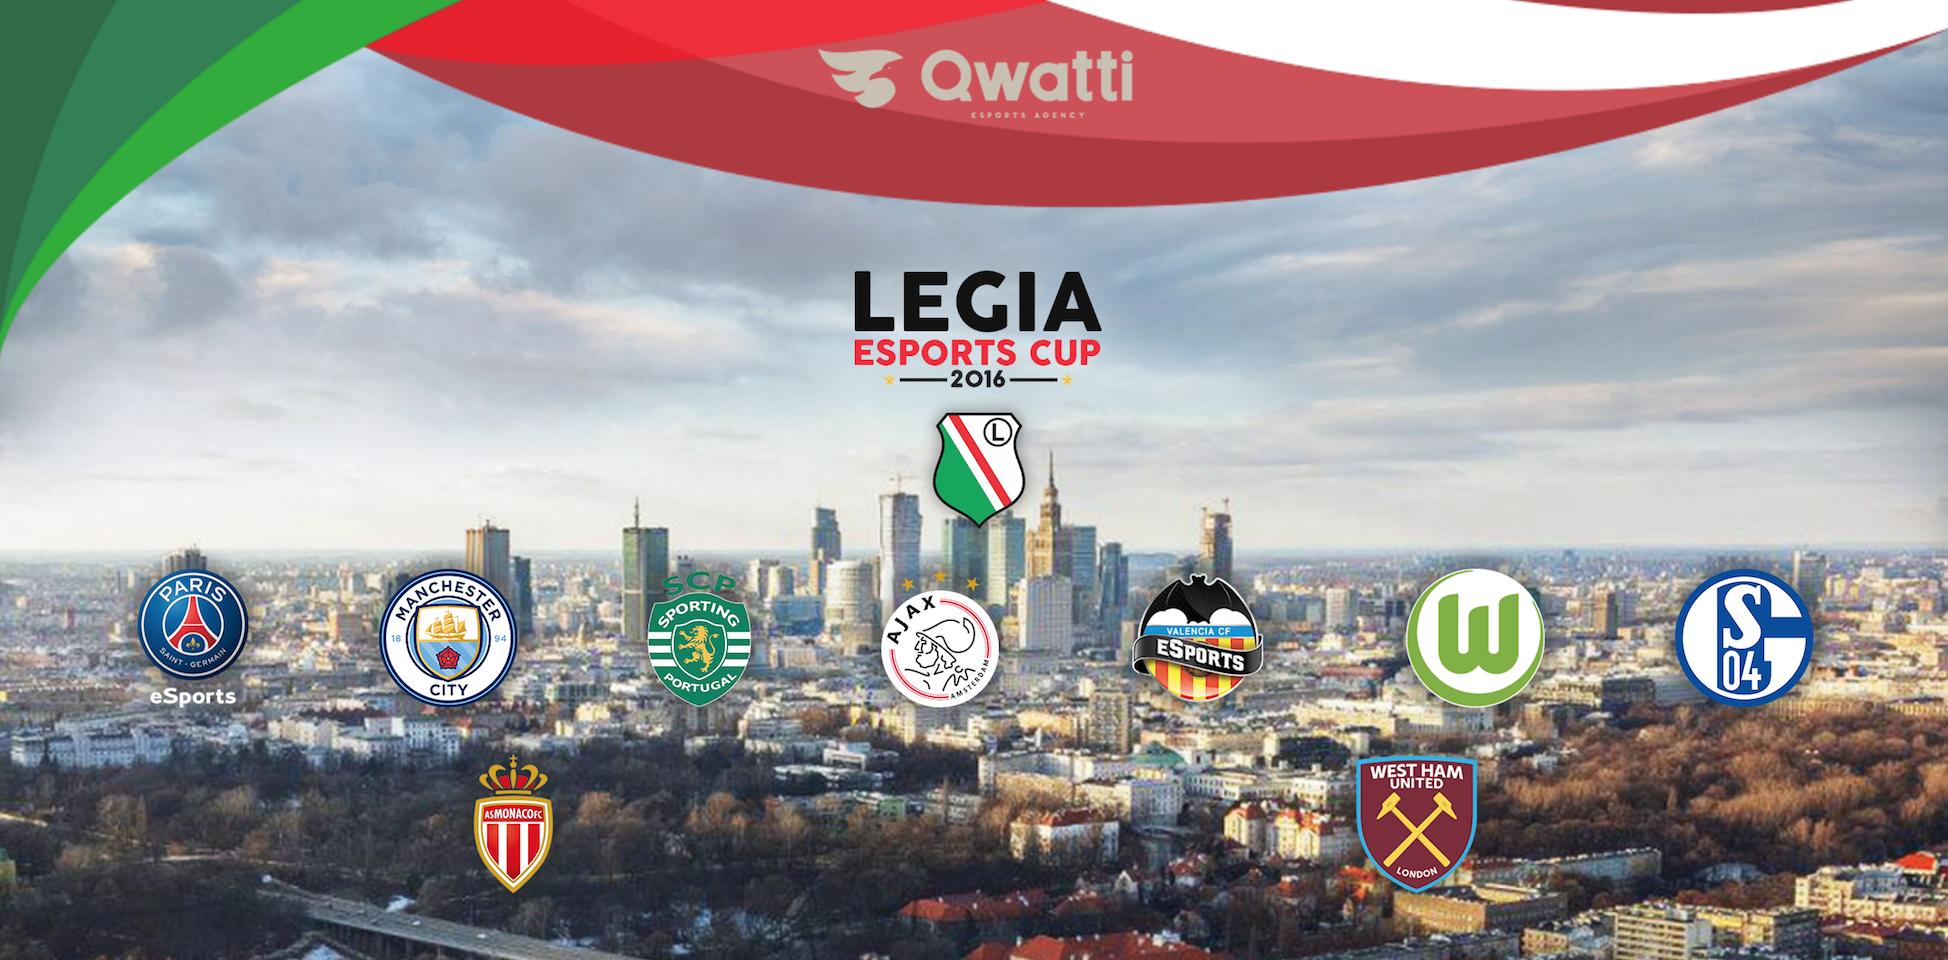 Legia eSports Cup (Photo: Qwatti eSports )